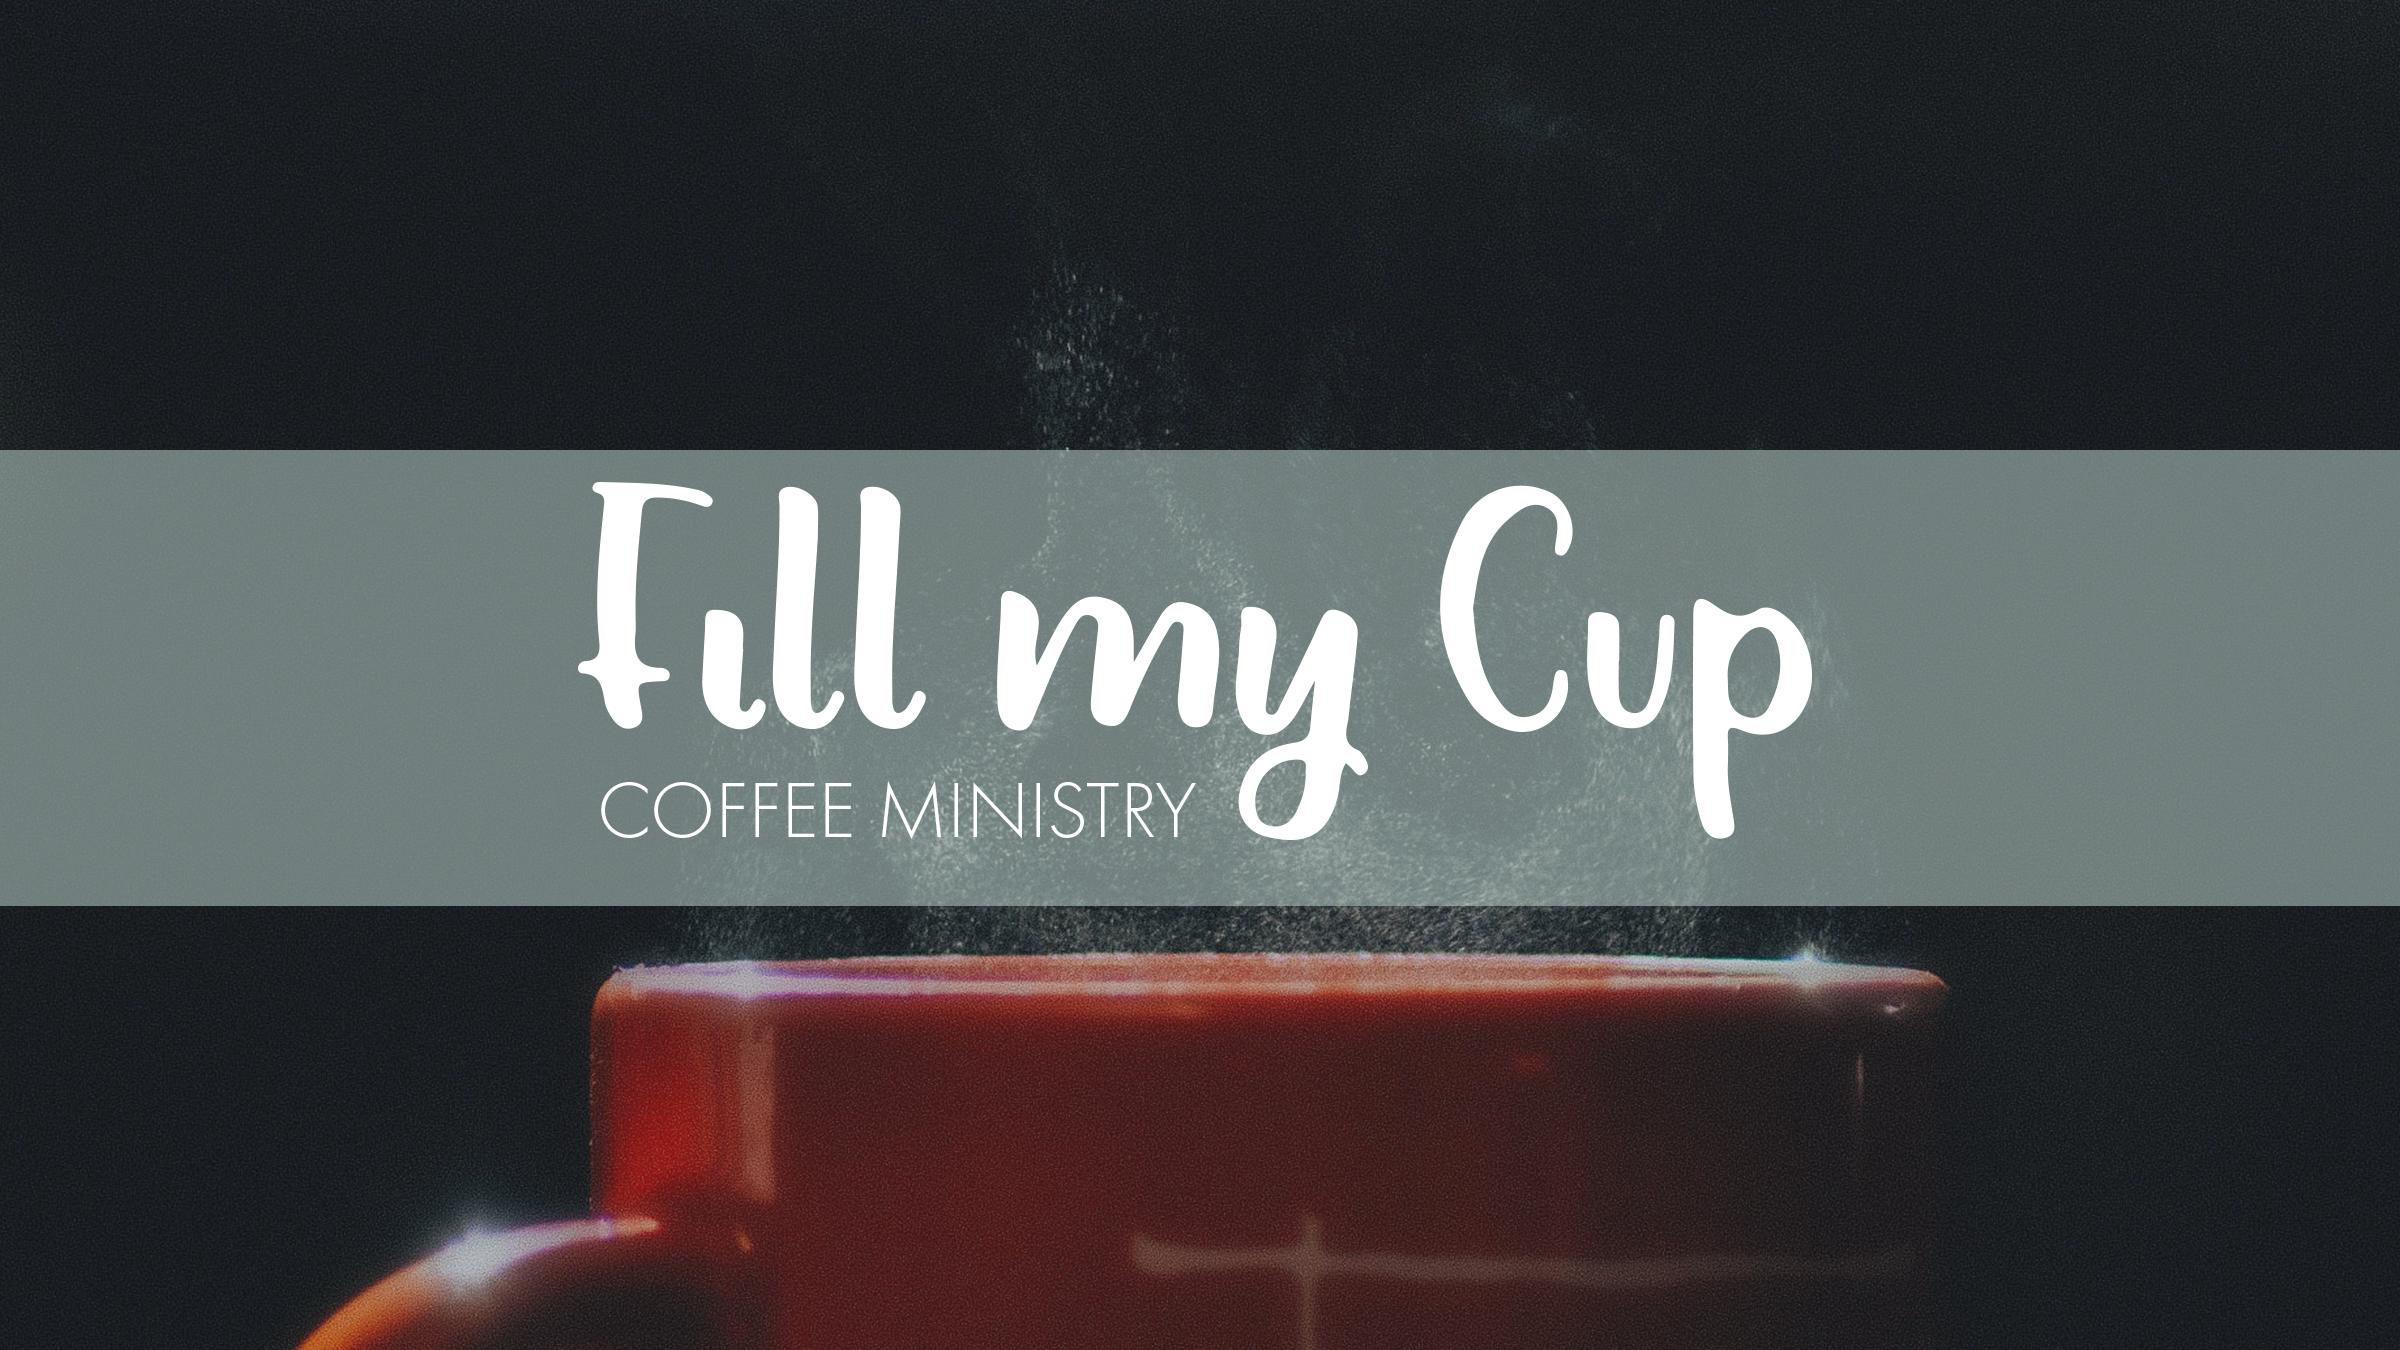 Fill-my-cup.jpg